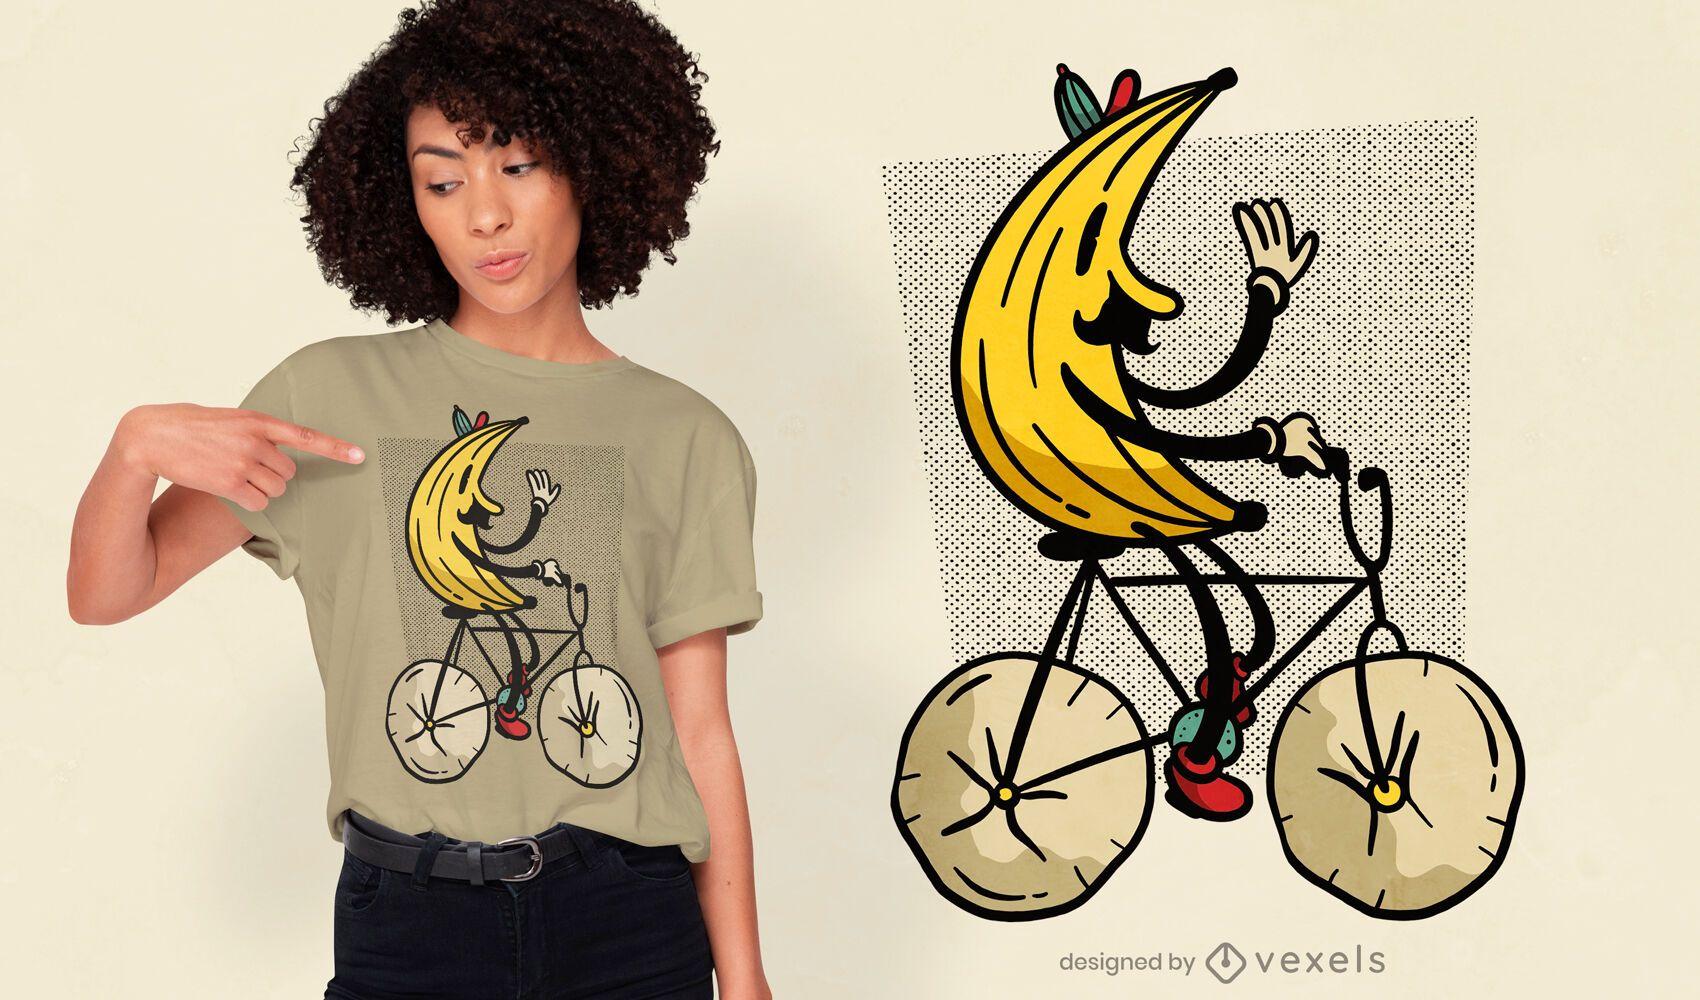 Banana riding bicycle funny t-shirt design